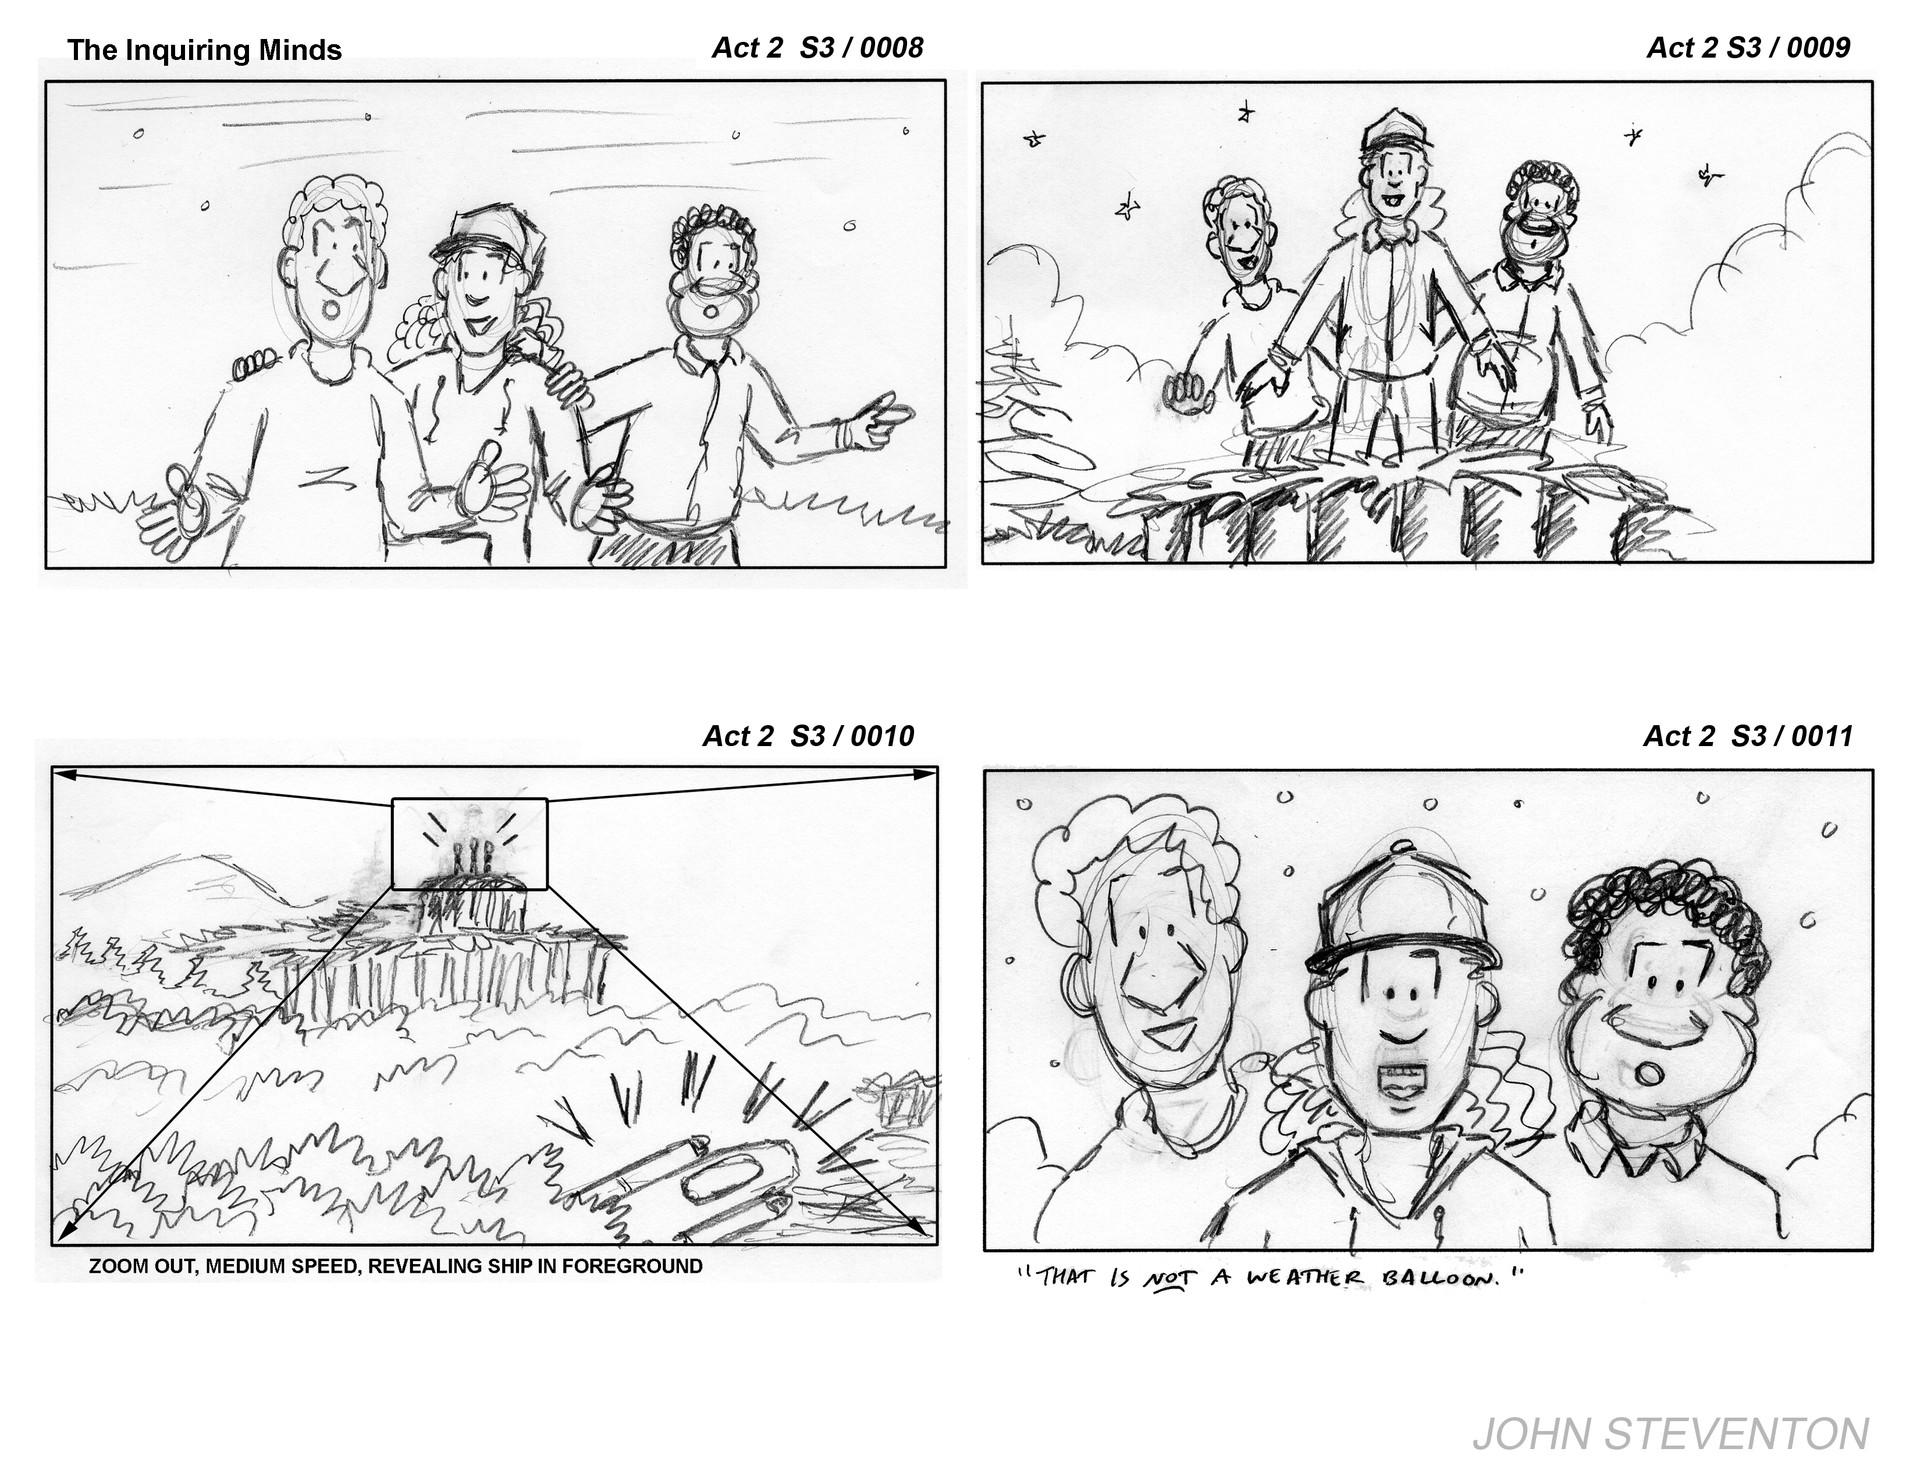 John steventon storyboard 3